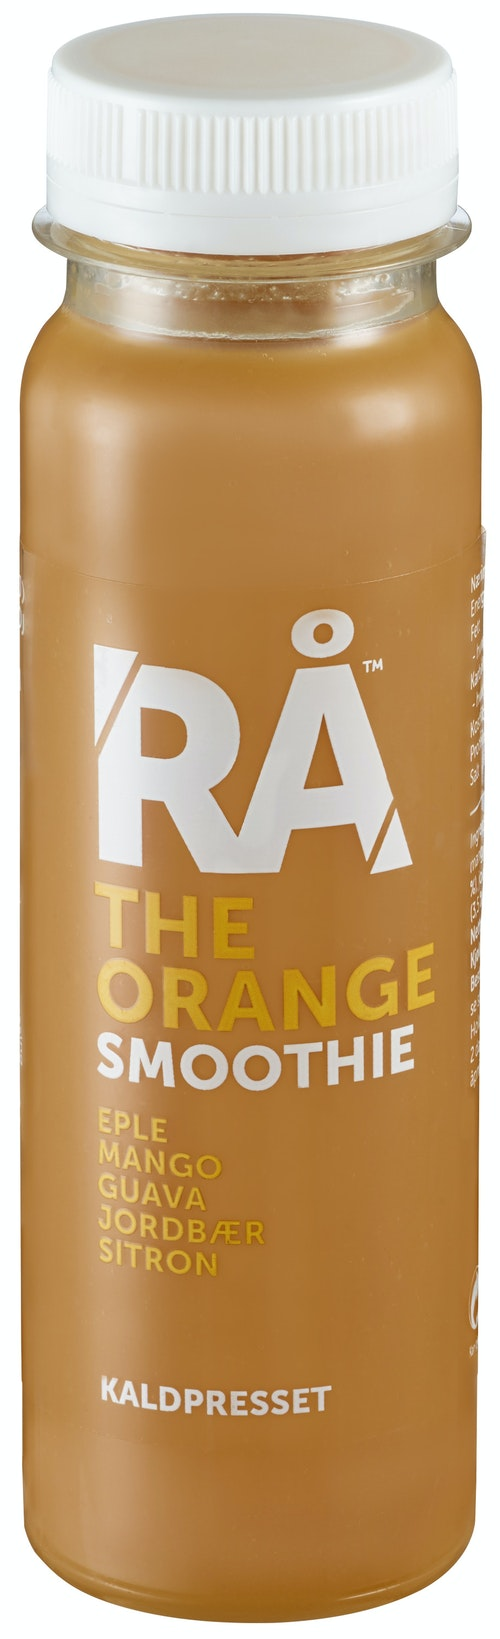 Synnøve Rå Orange Smoothie 200 ml